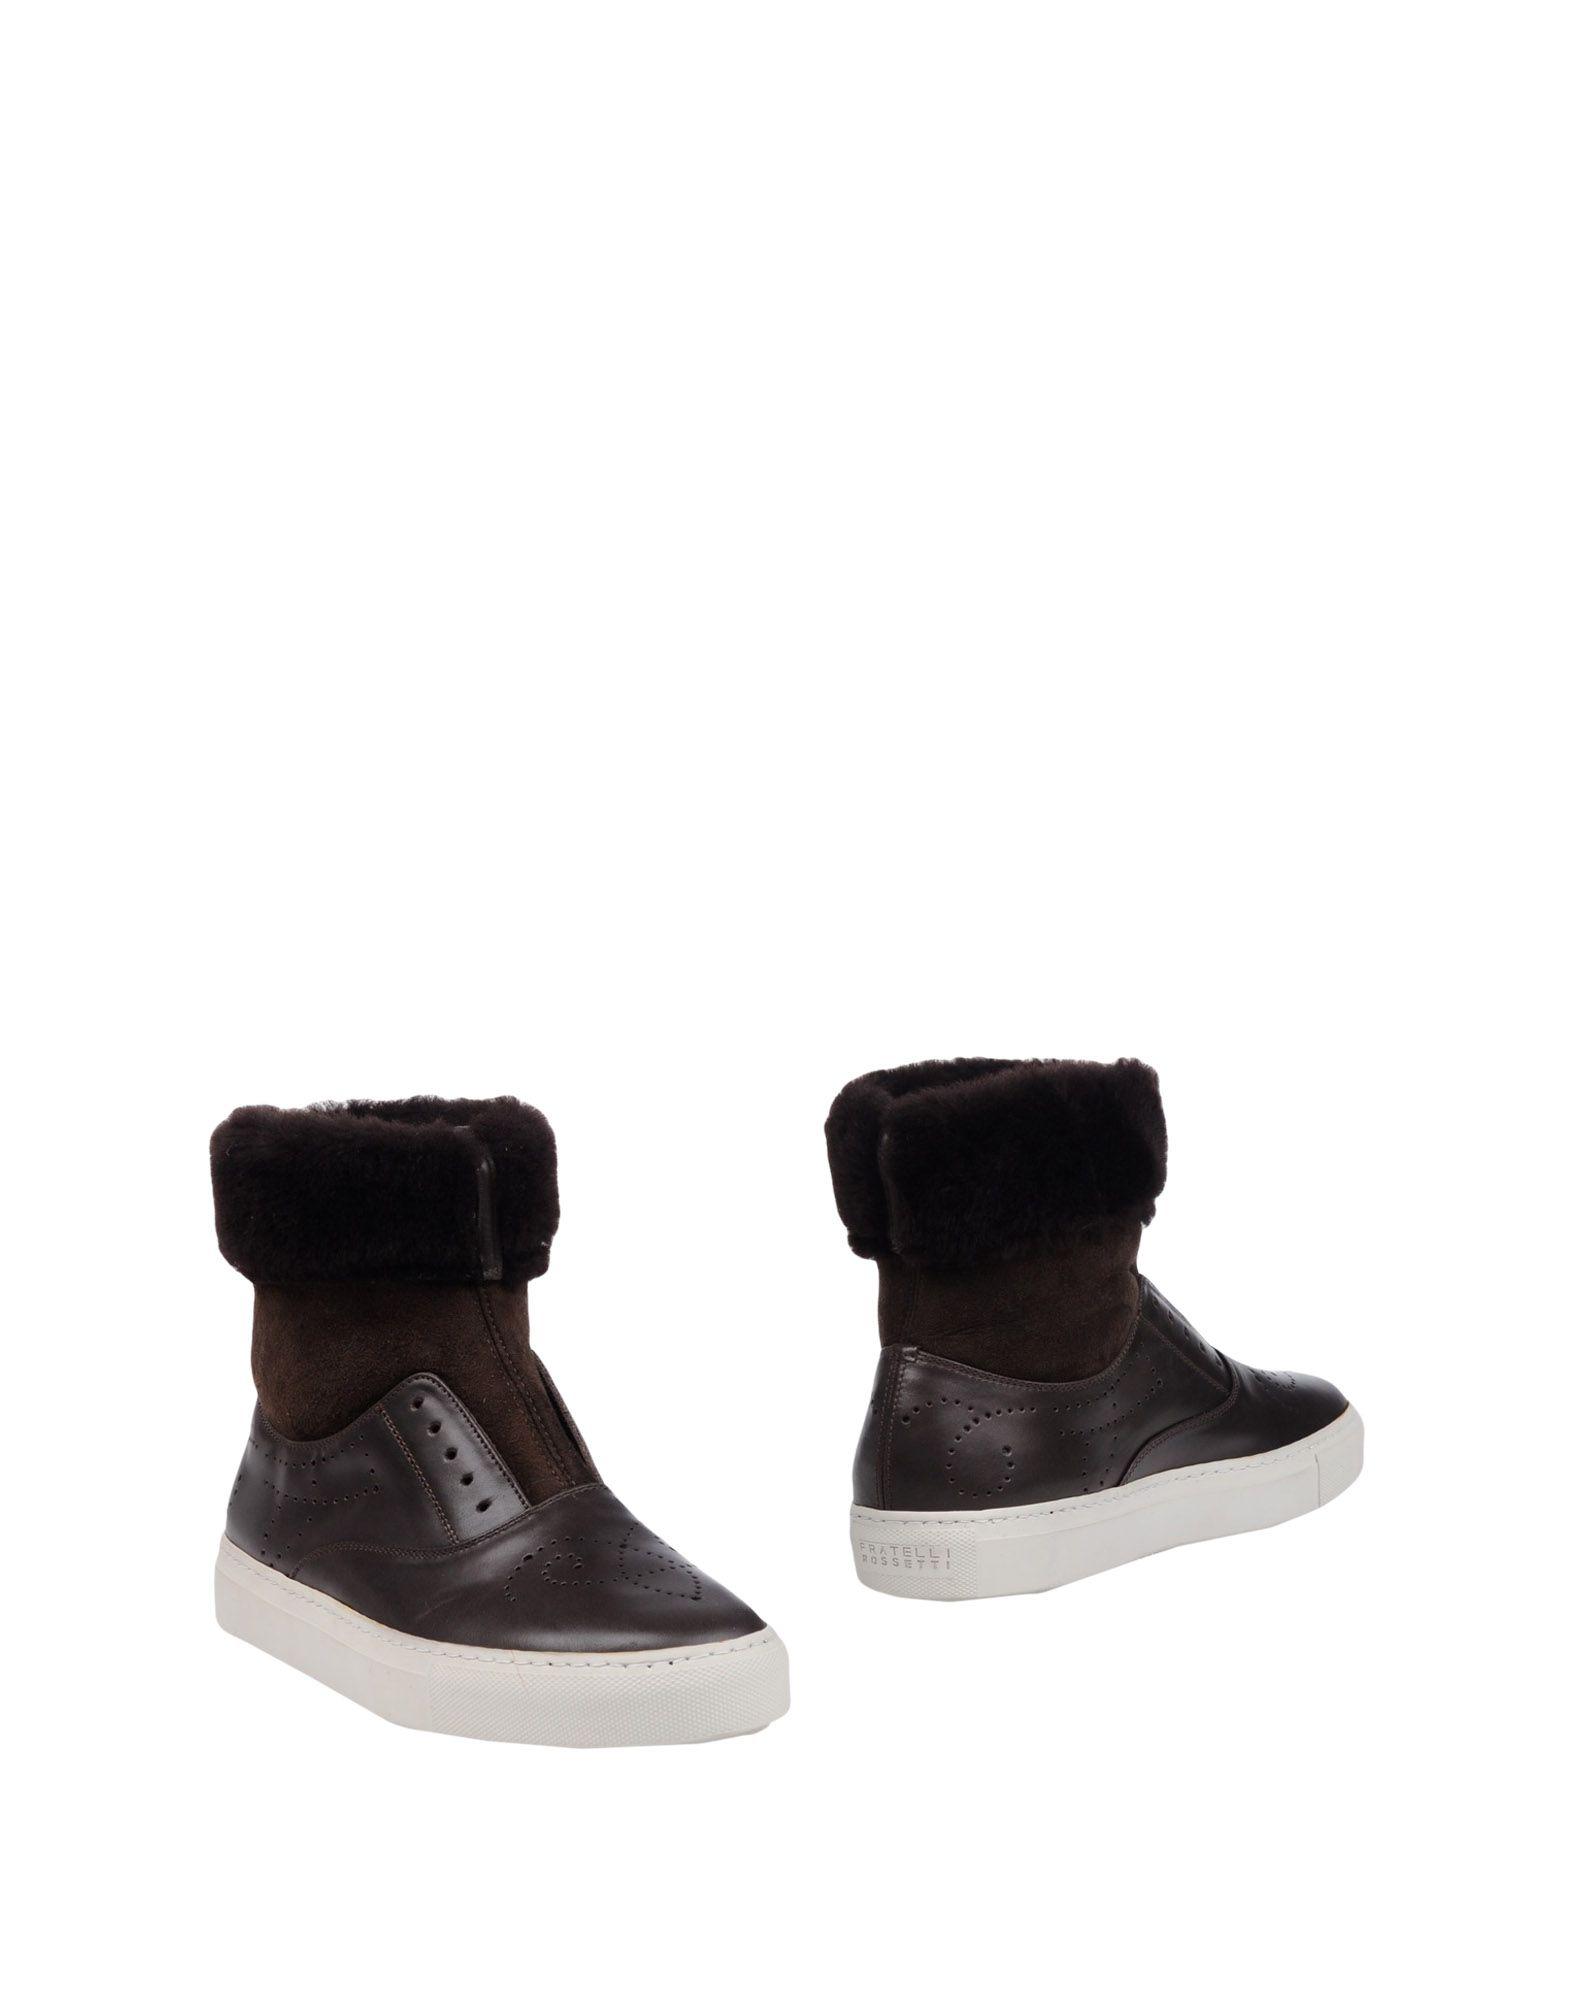 Fratelli Rossetti Stiefelette Damen  11281863UWGut aussehende strapazierfähige Schuhe